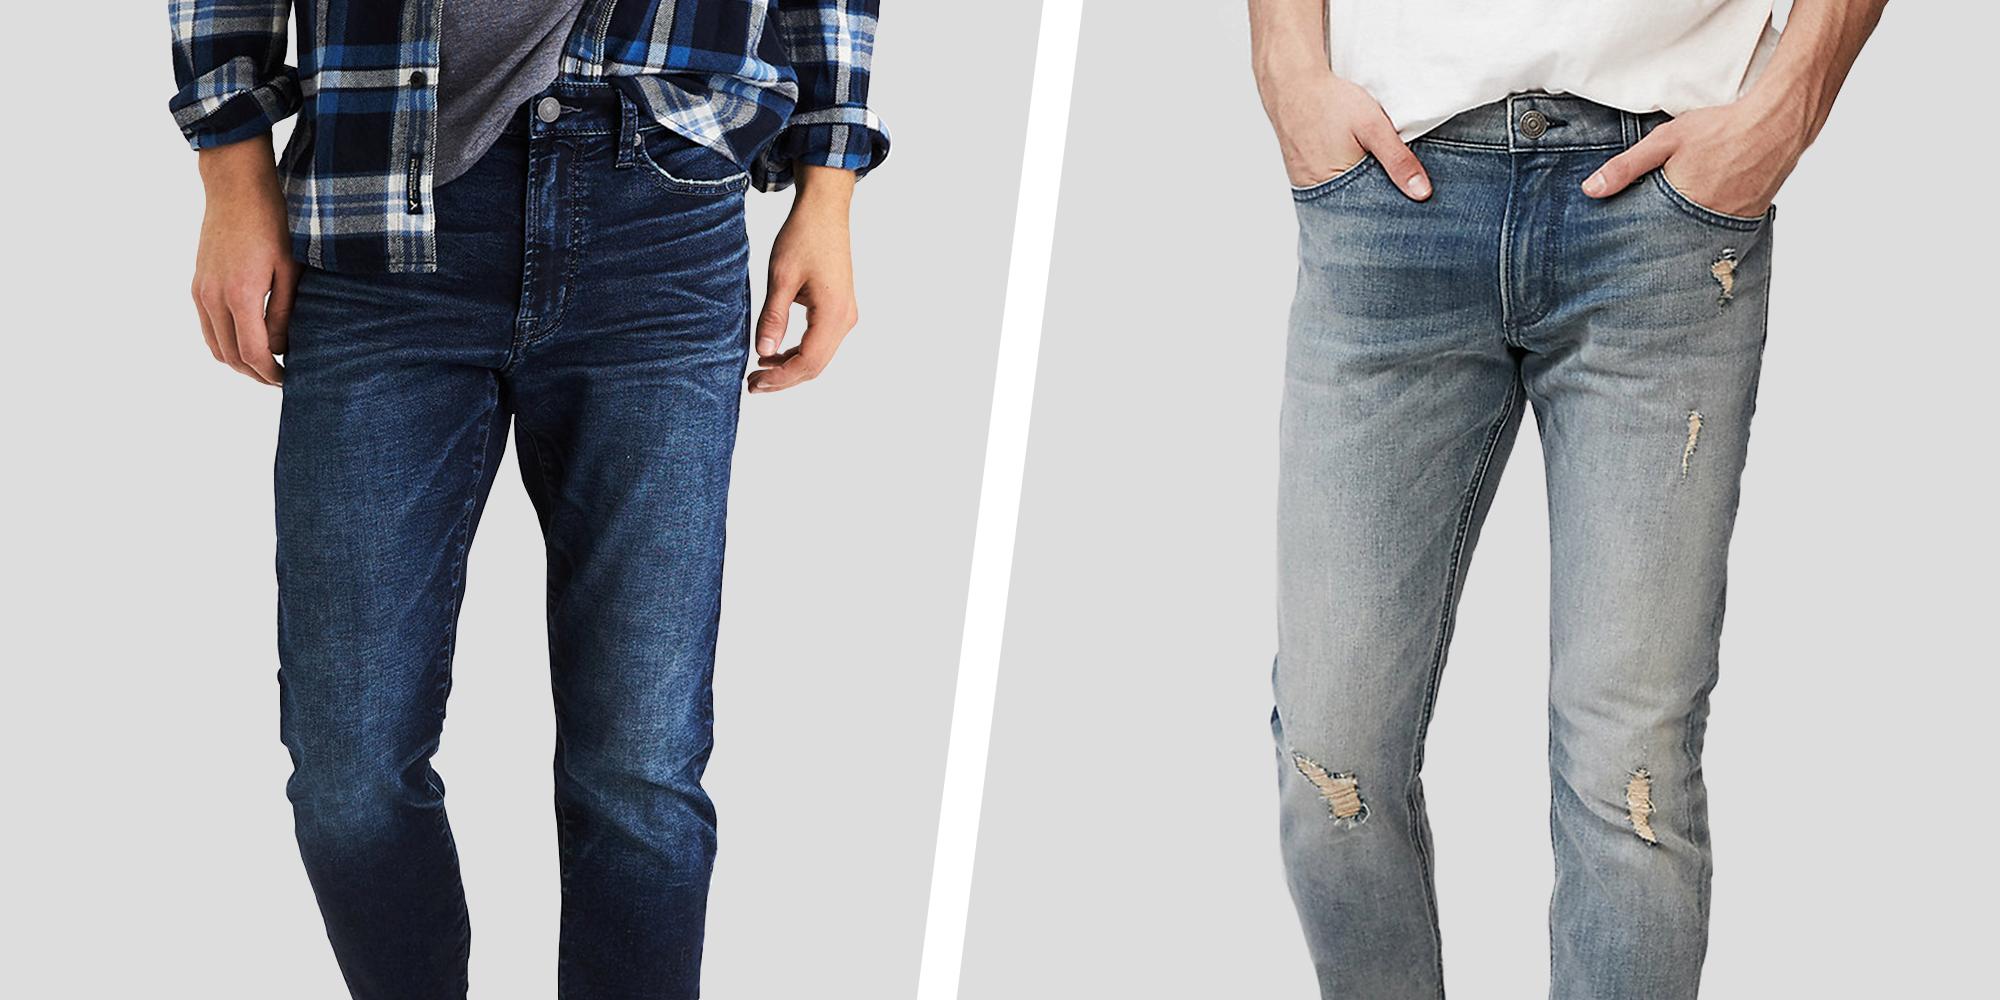 25 Best Jeans for Men To Wear In 2018 — Best Denim Brands for Guys 3bffb959f0